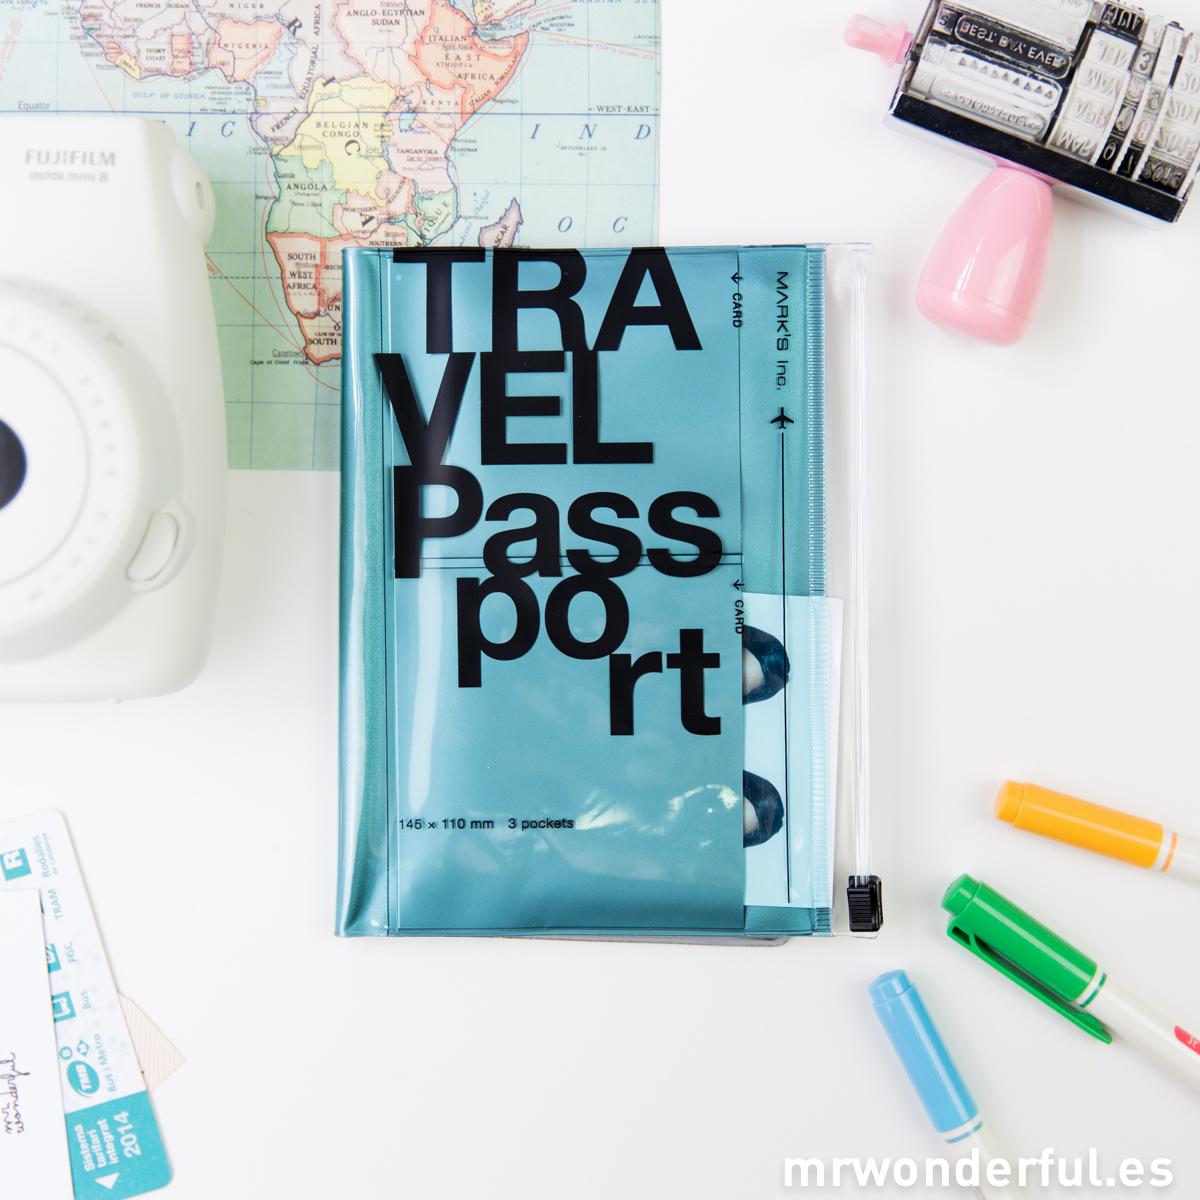 mrwonderful_TVK-PP1-MBL_funda-pasaporte-azul-1